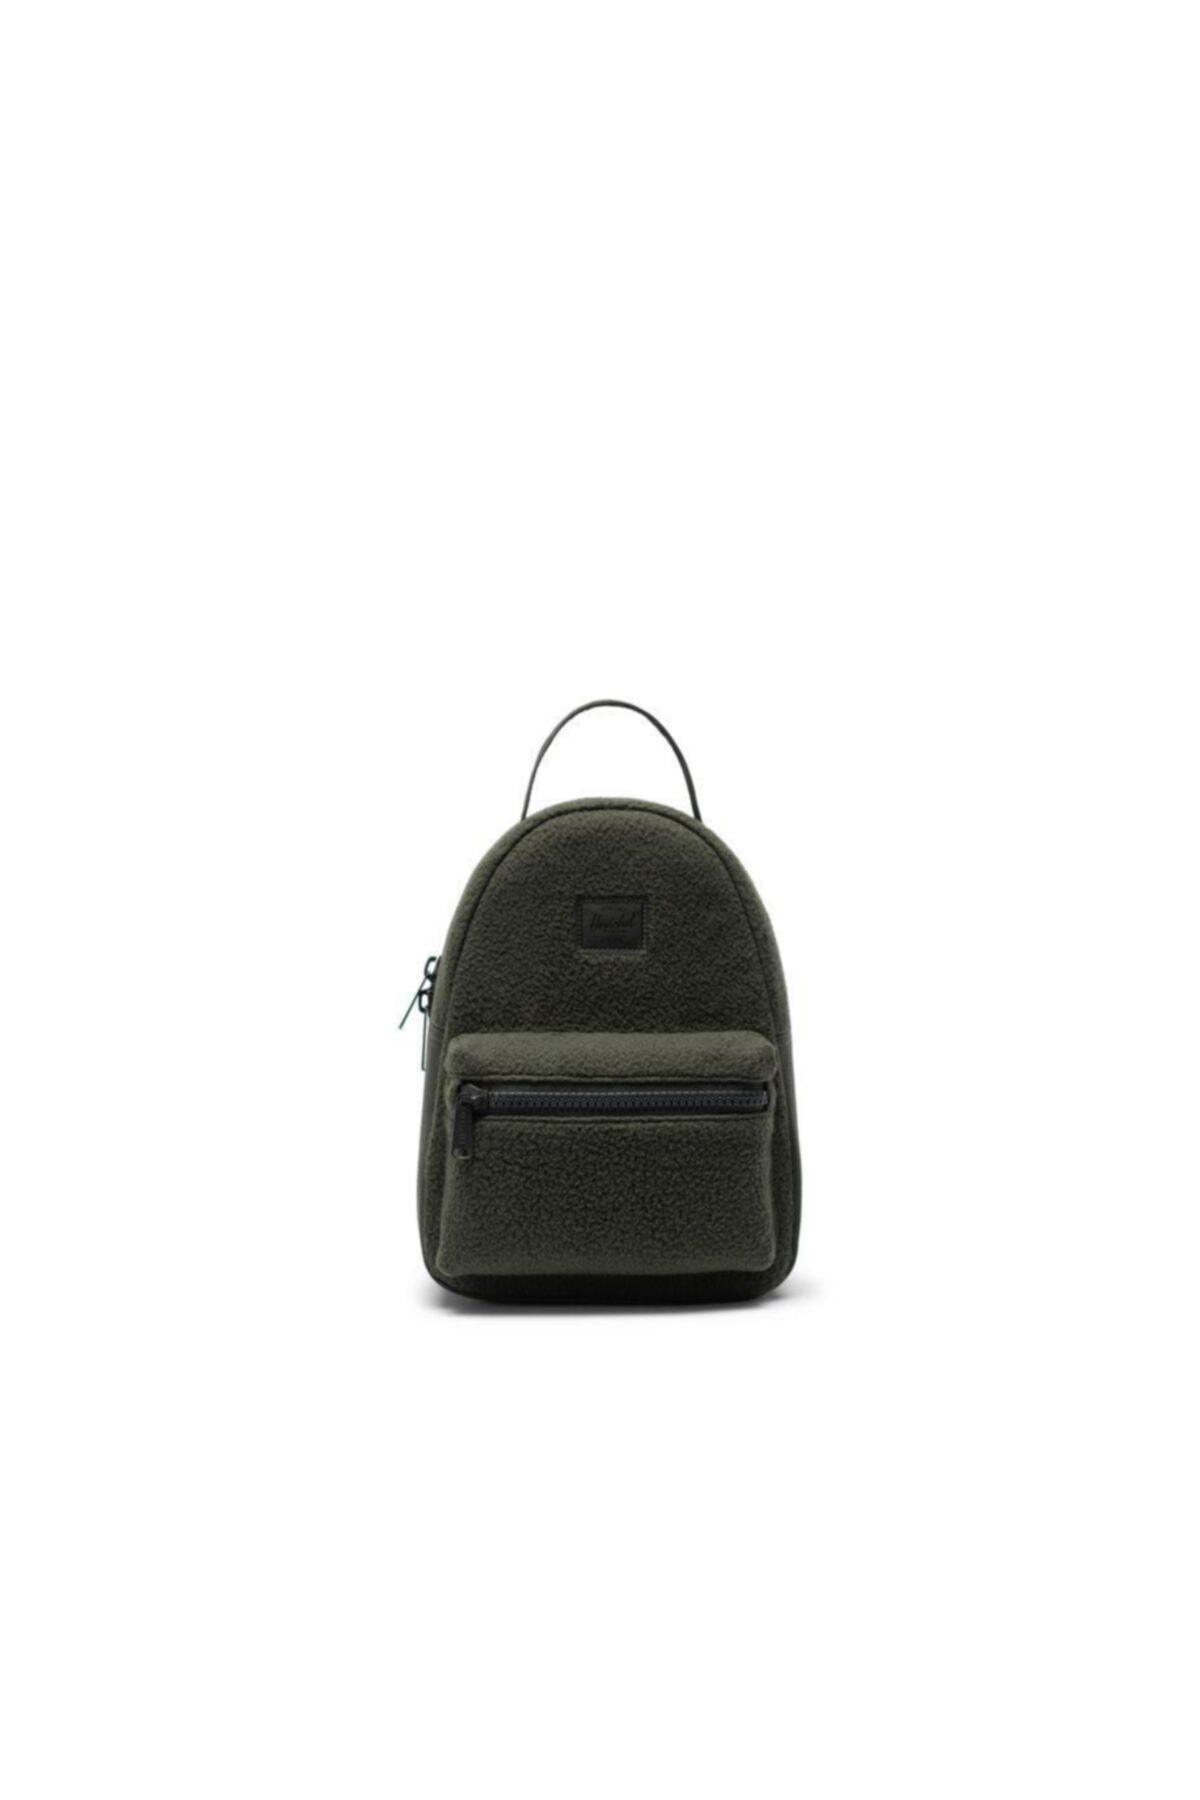 Herschel Supply Co. Unisex Termos - Nova Mini Sherpa Dark Olive  - 10501-03244-OS 1